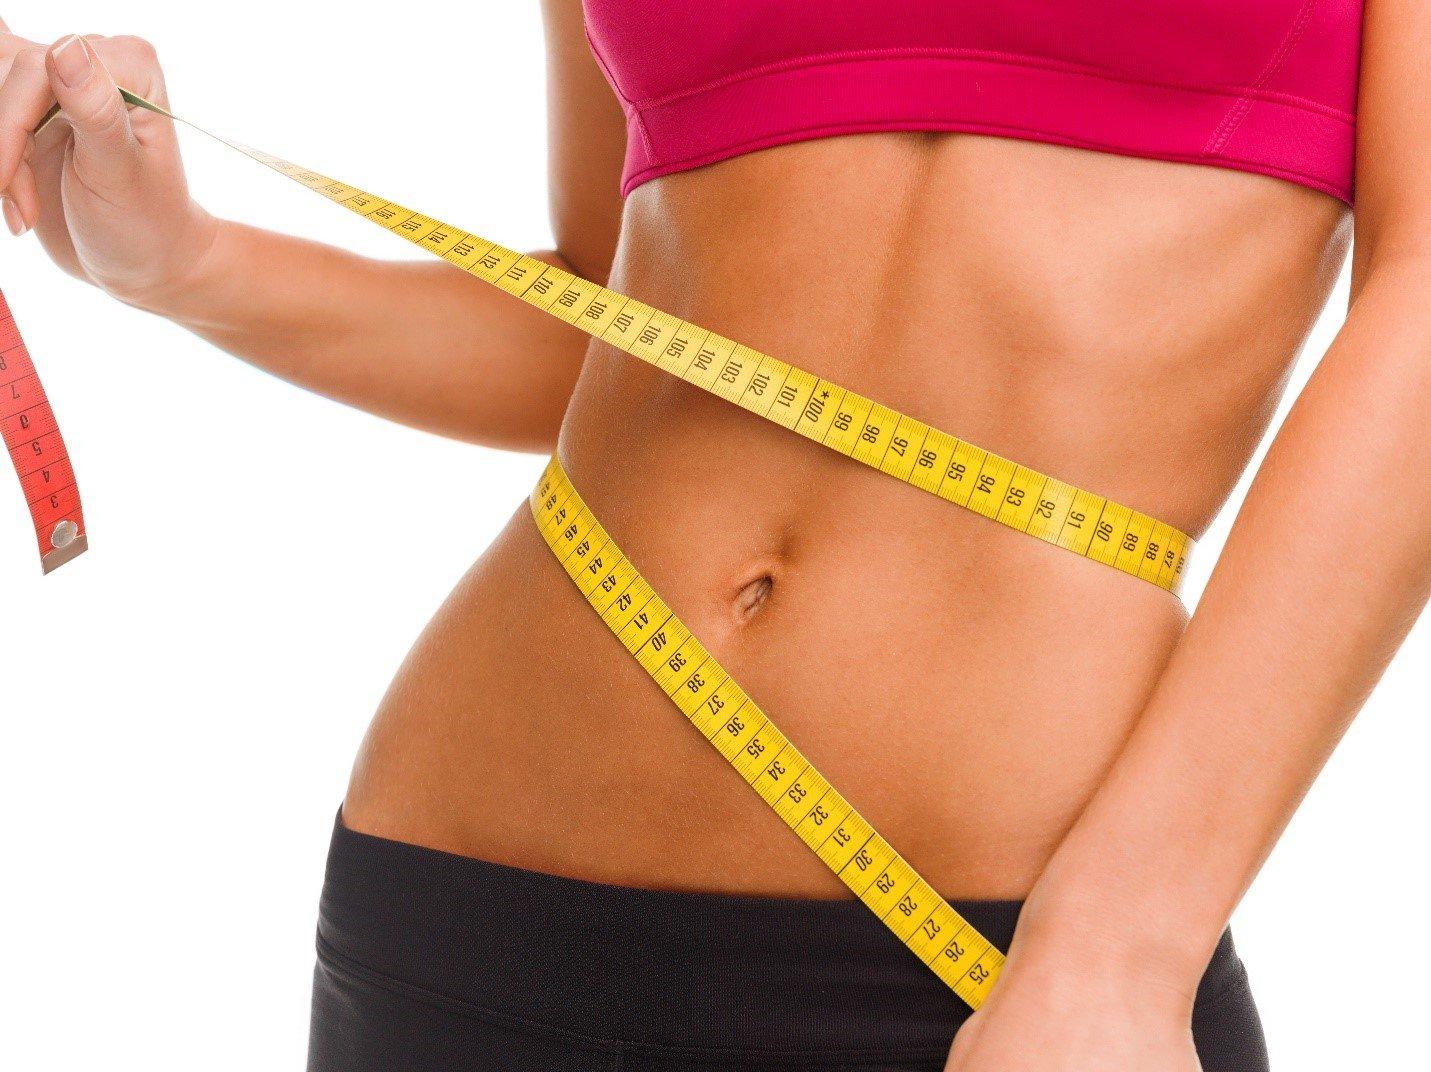 Сайт онлайн похудение